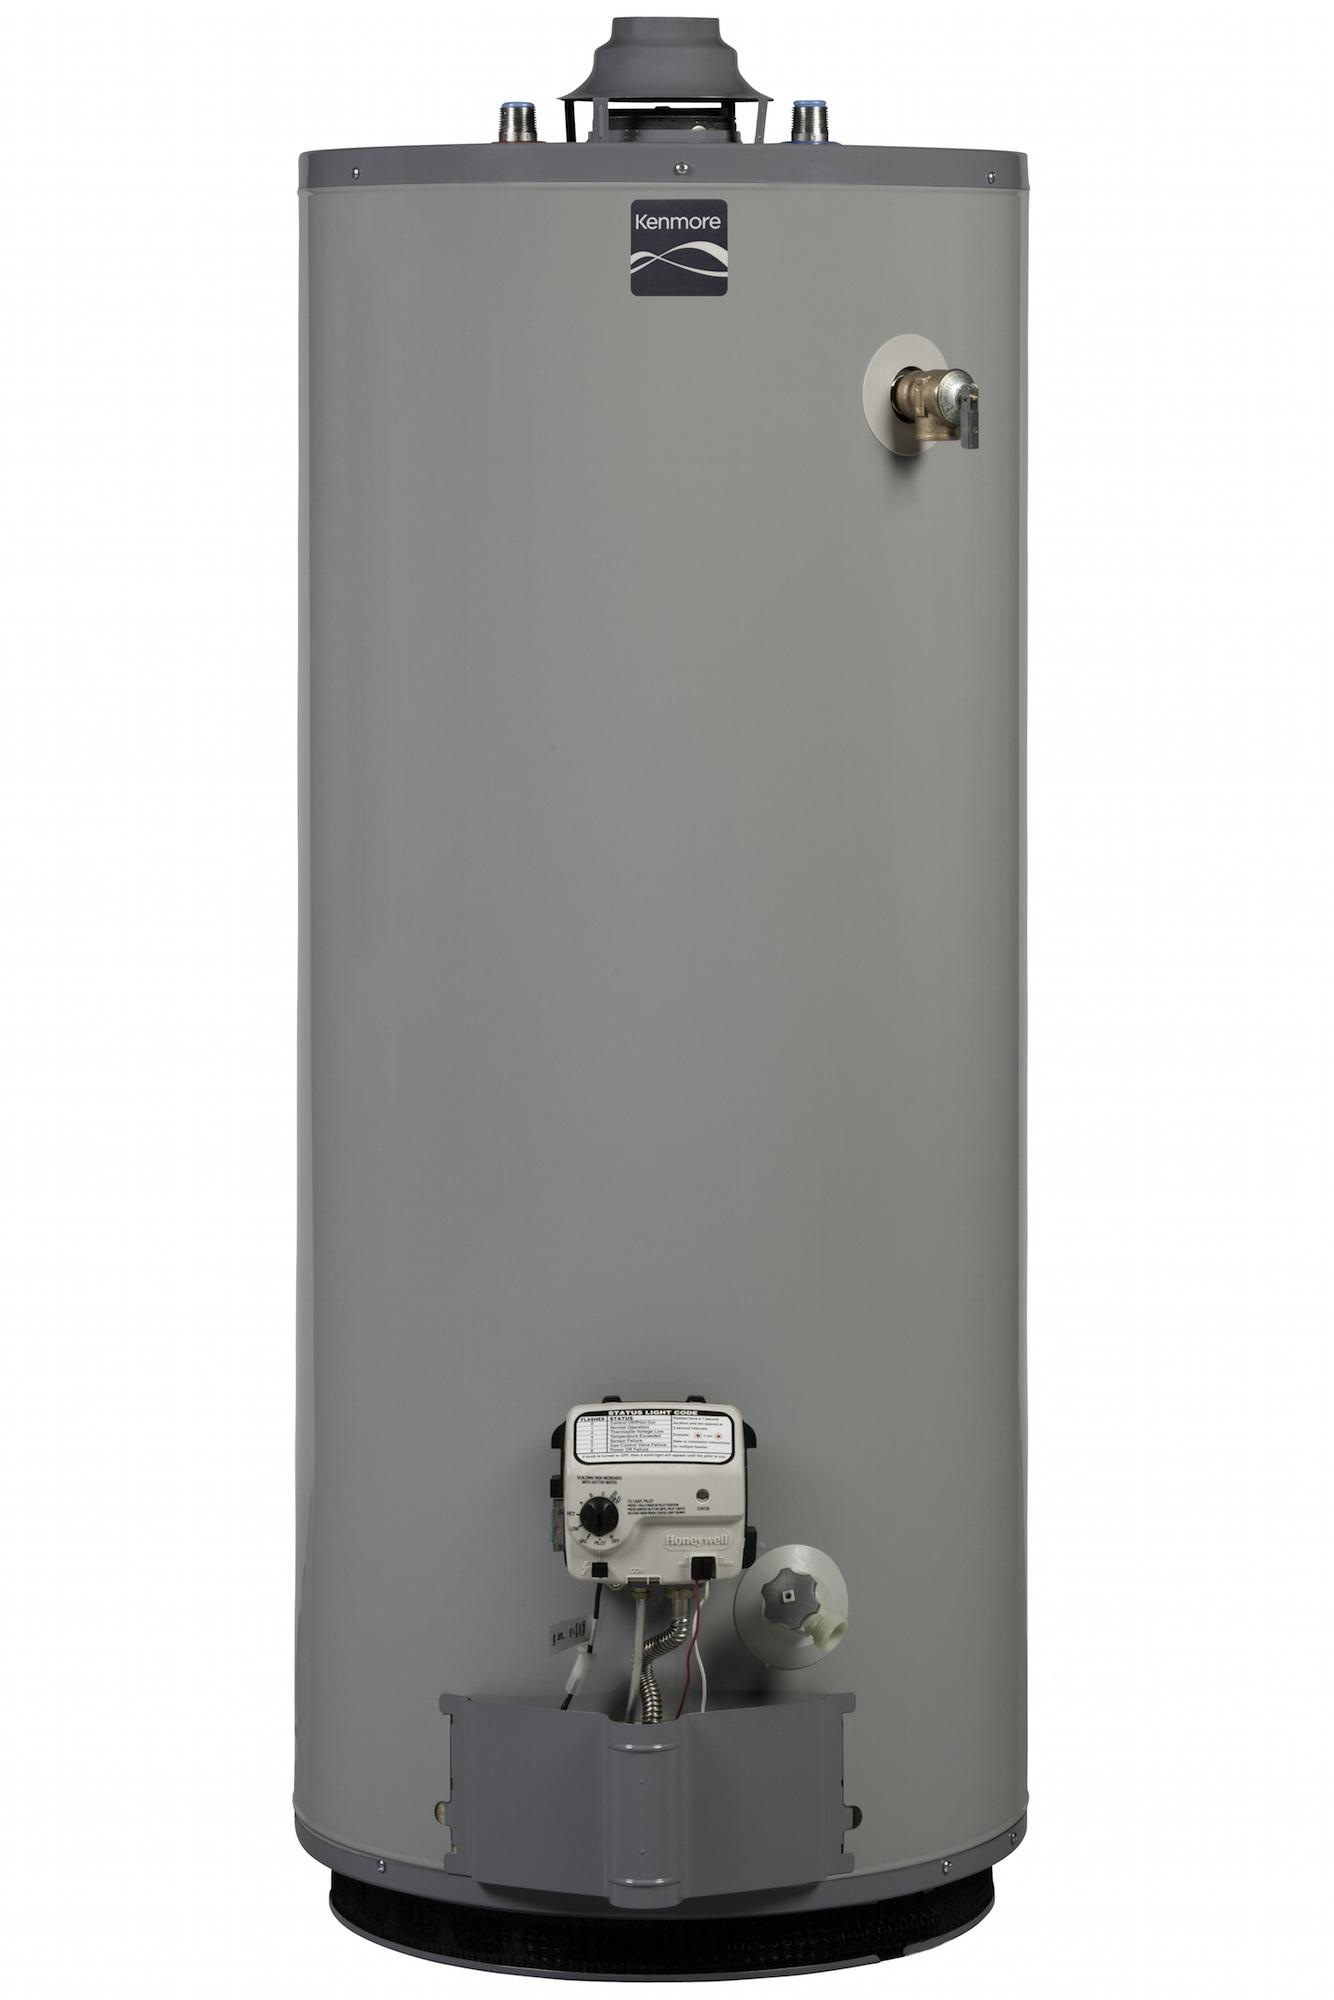 Kenmore 57940 40 Gal 9 Year Short Natural Gas Water